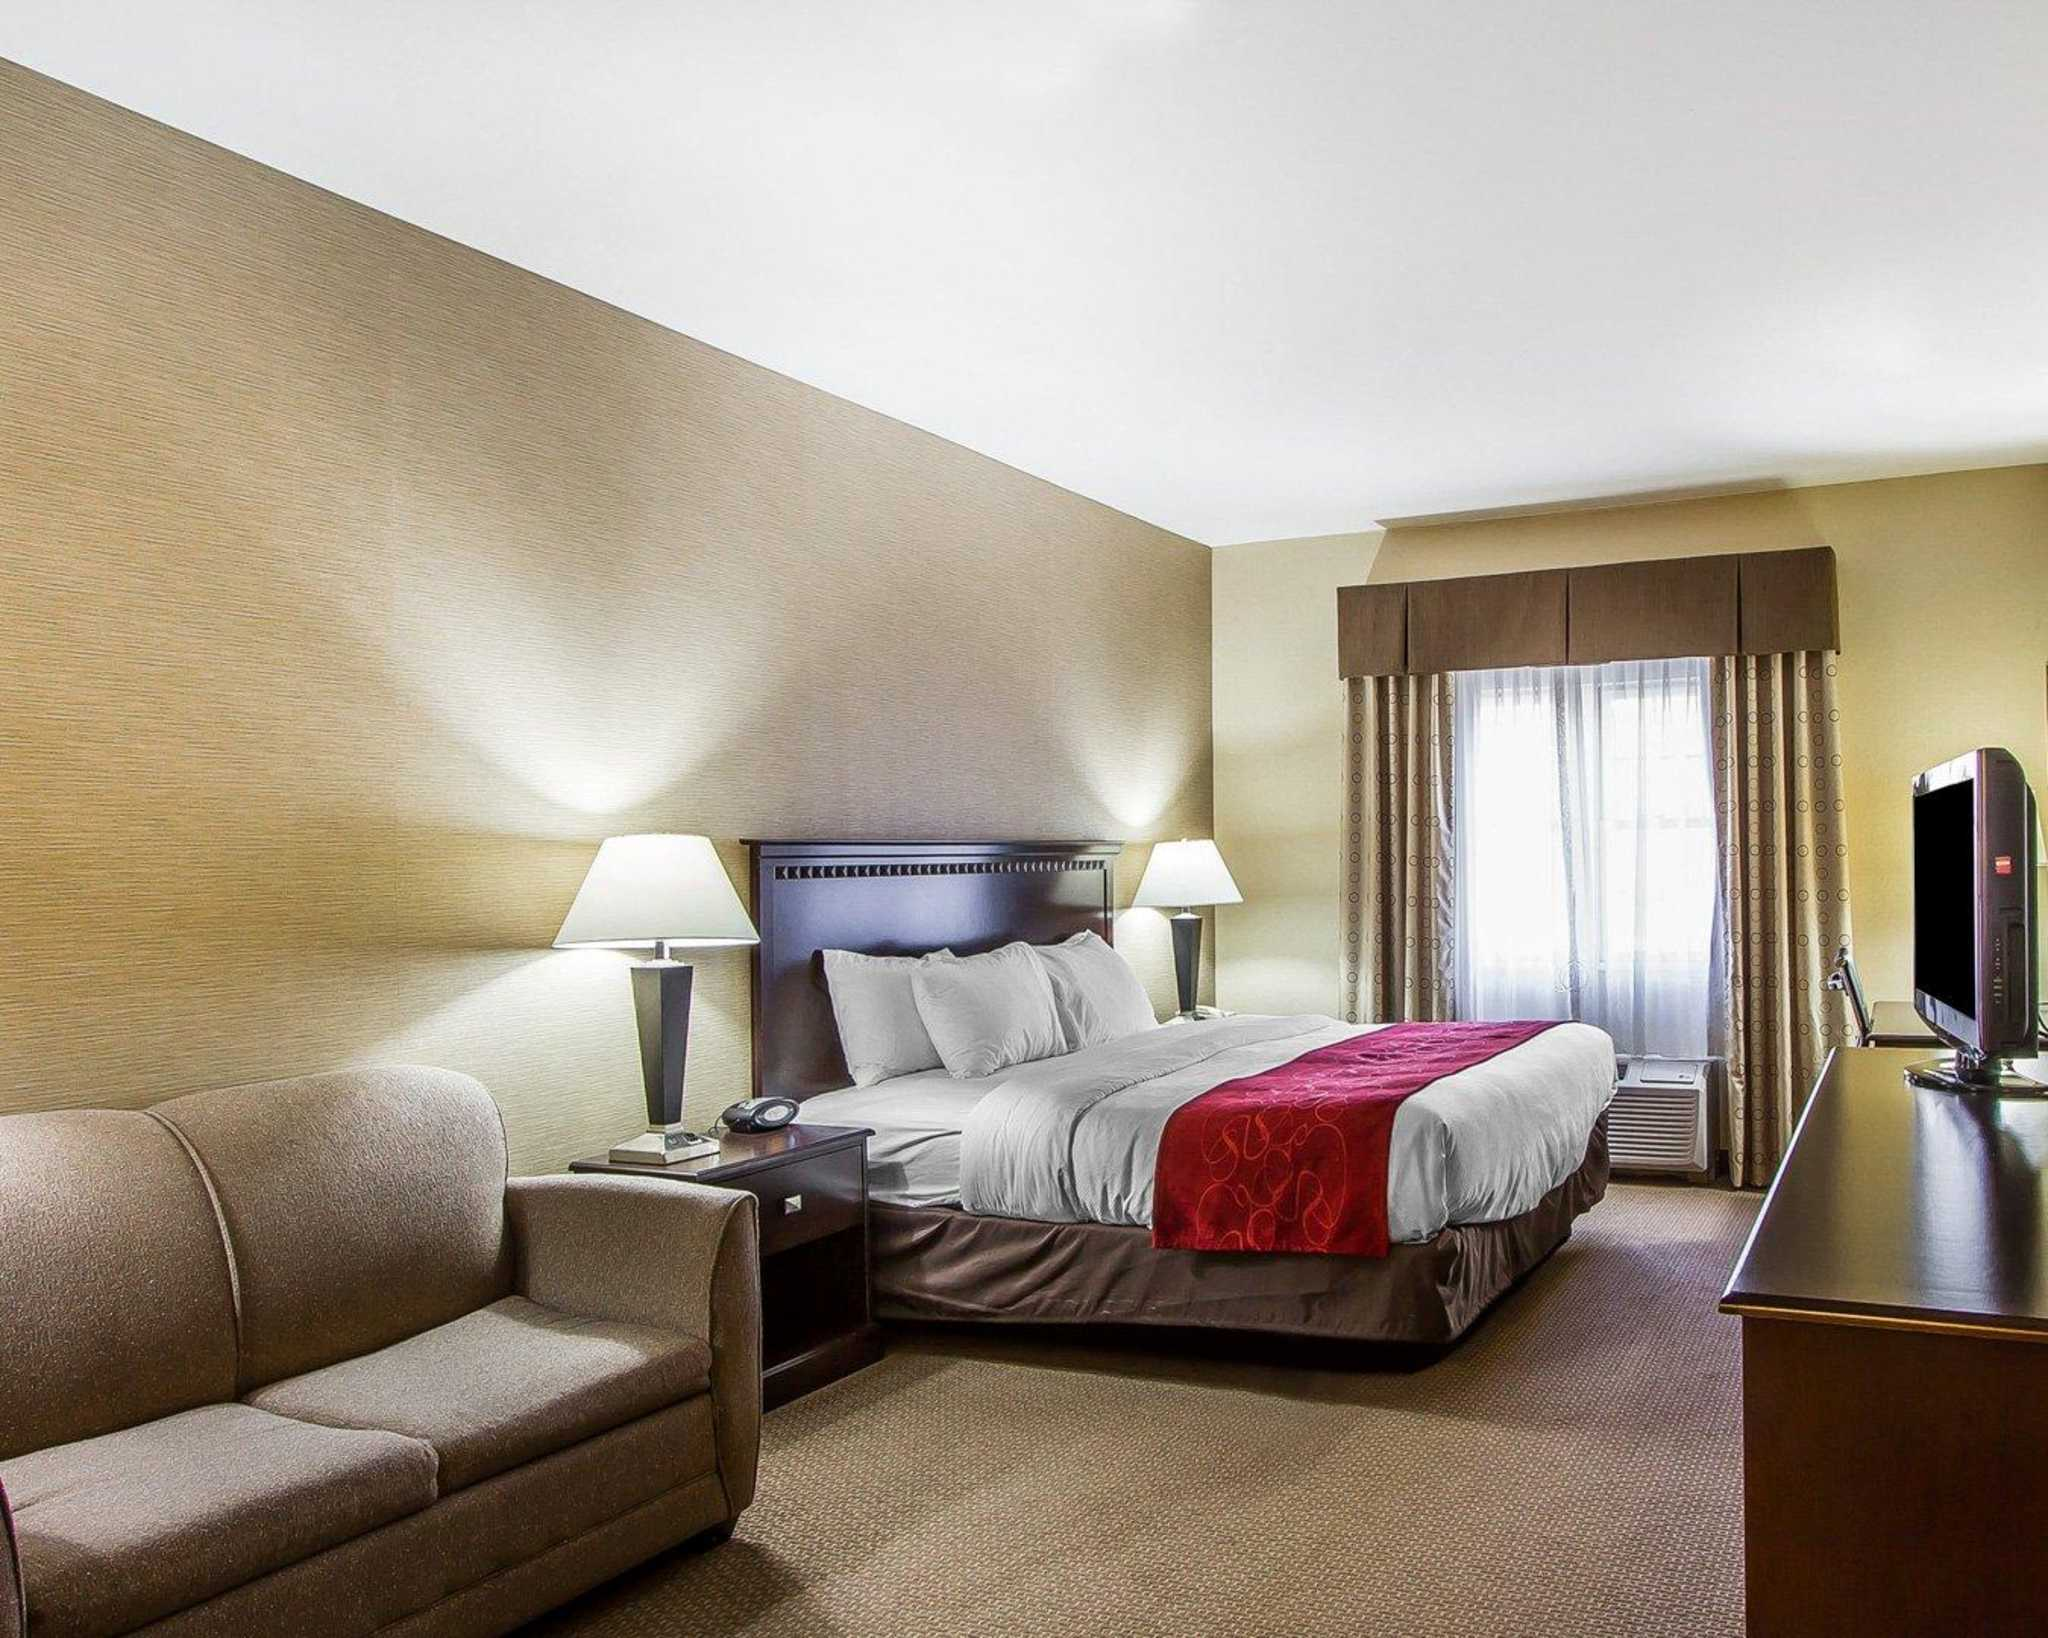 Quality Suites image 16